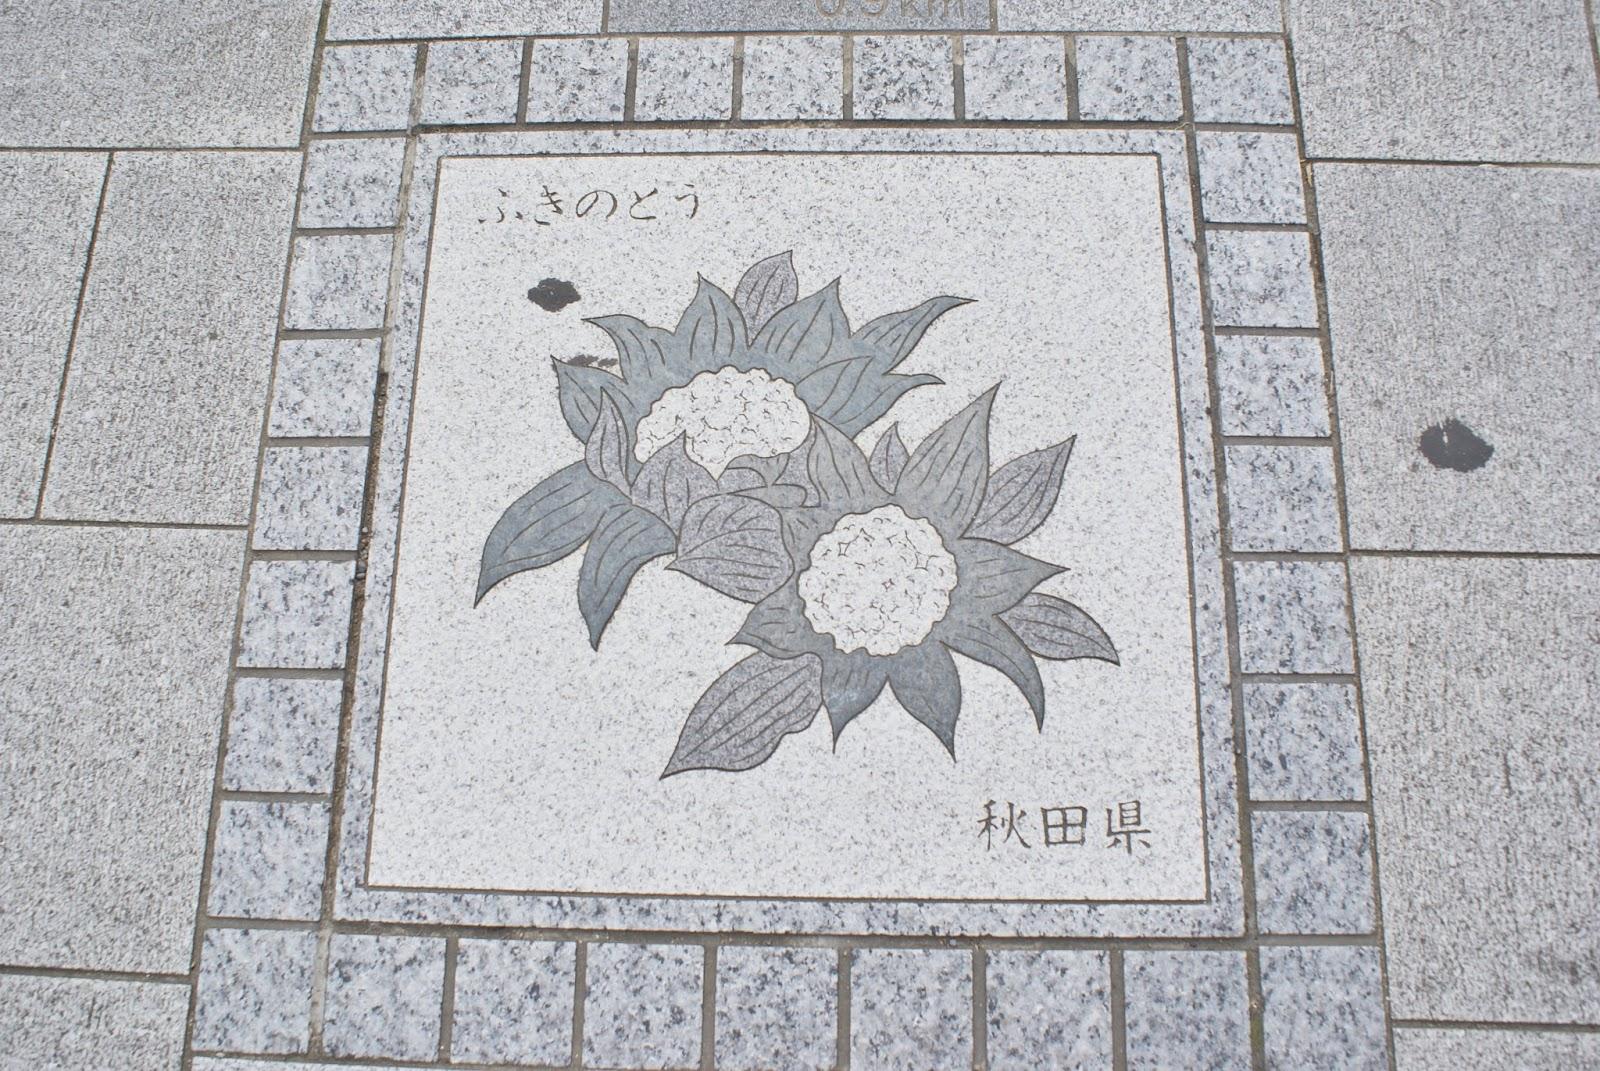 chrysanthemum tokyo marunouchi imperial palace Kōkyo